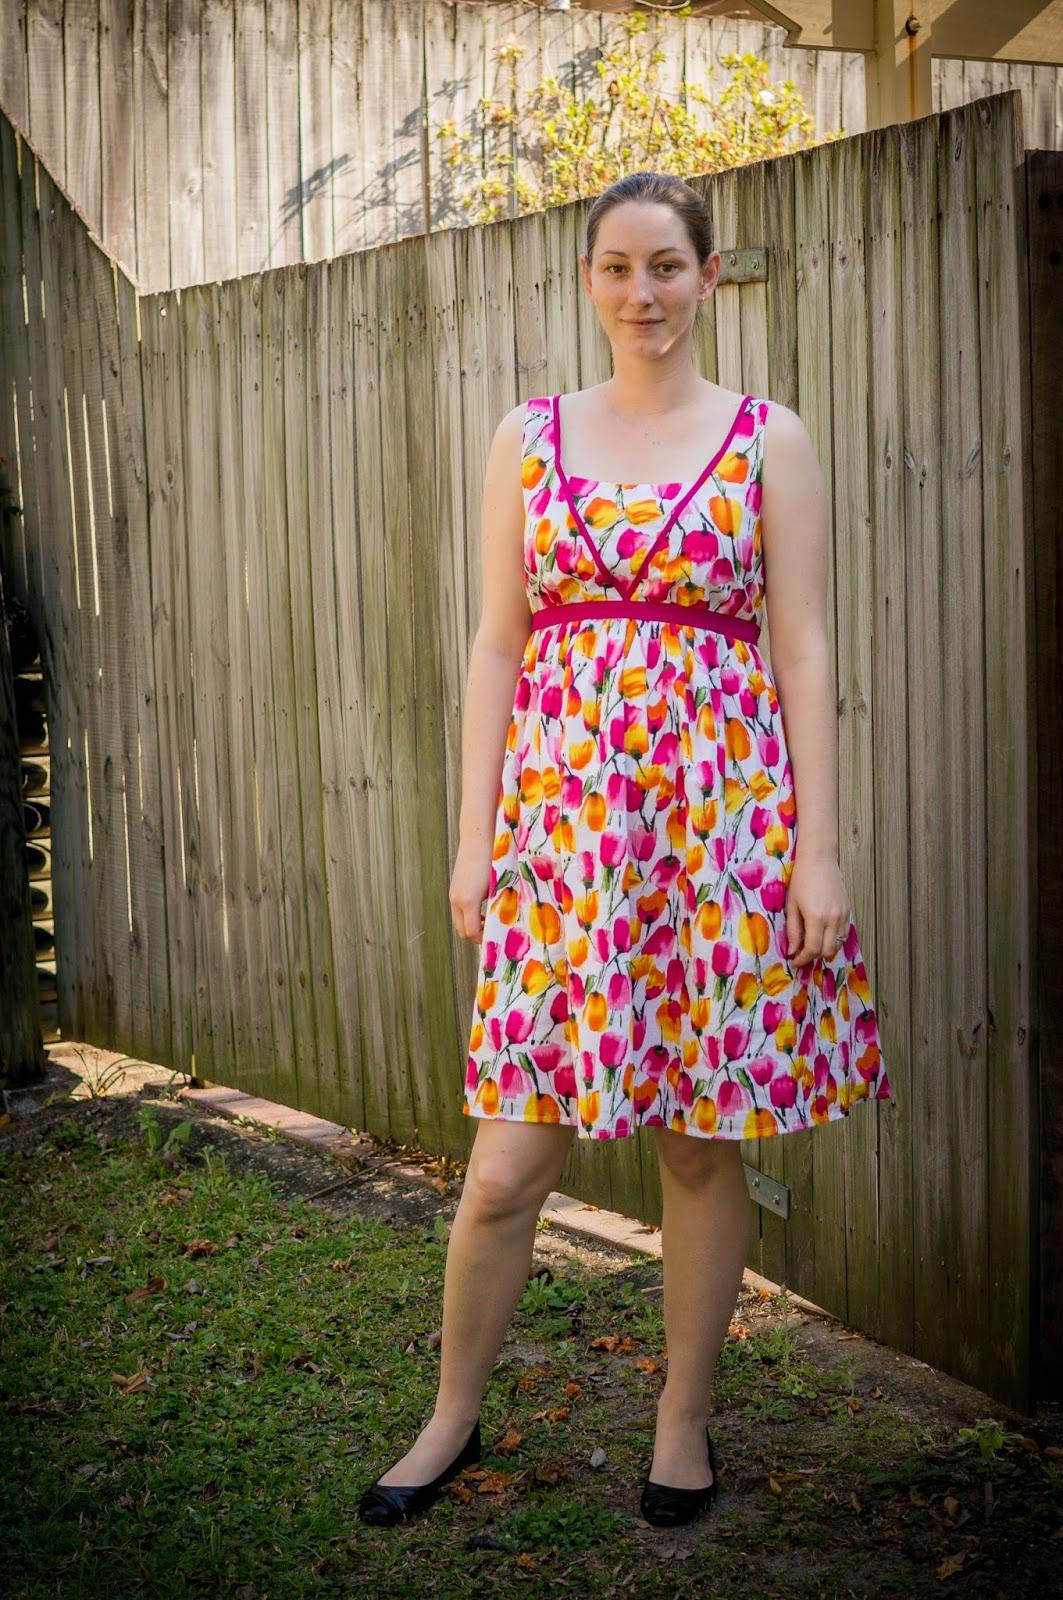 Twenty First Century Lady Summer Maternity Dress Design